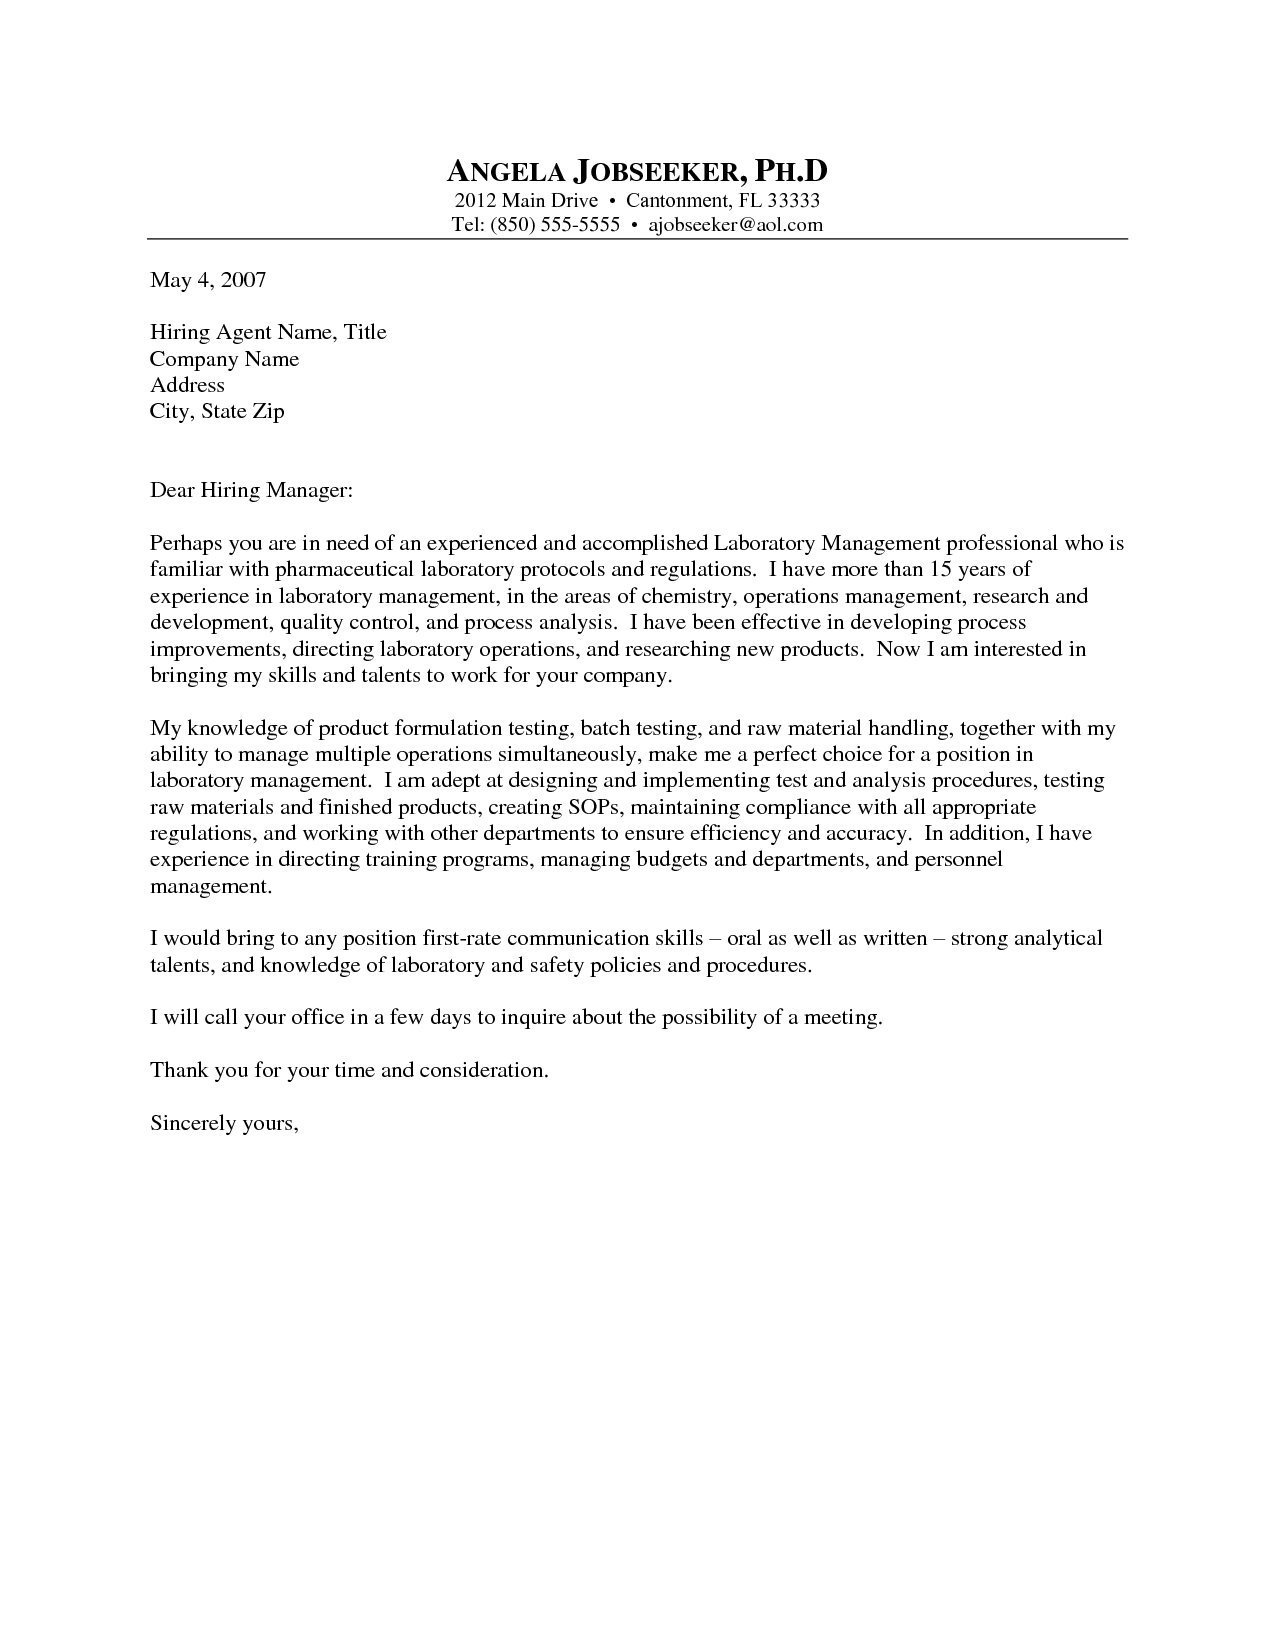 10 Ideal Summer Job Ideas For Teachers construction management cover letter outstanding cover letter best 2020